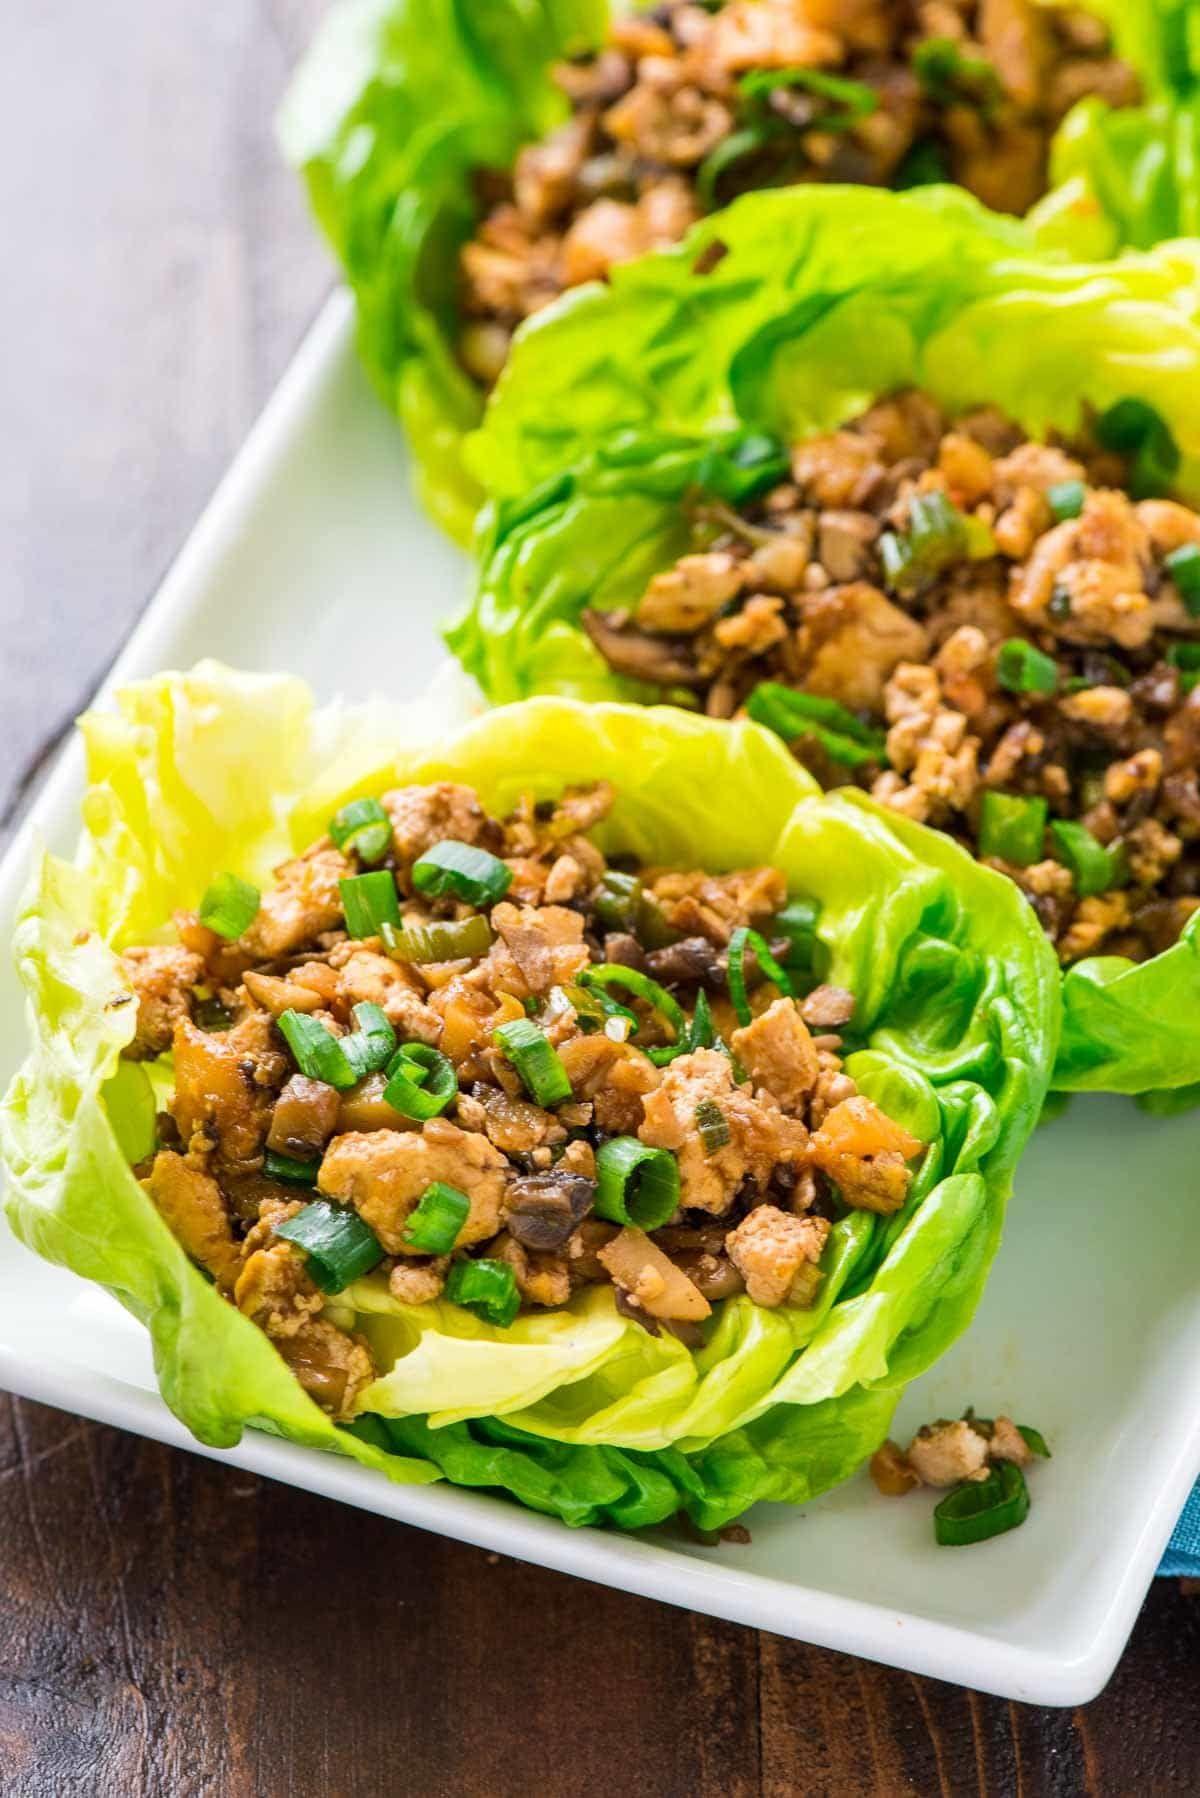 Copycat pf changs vegetarian lettuce wraps less than 200